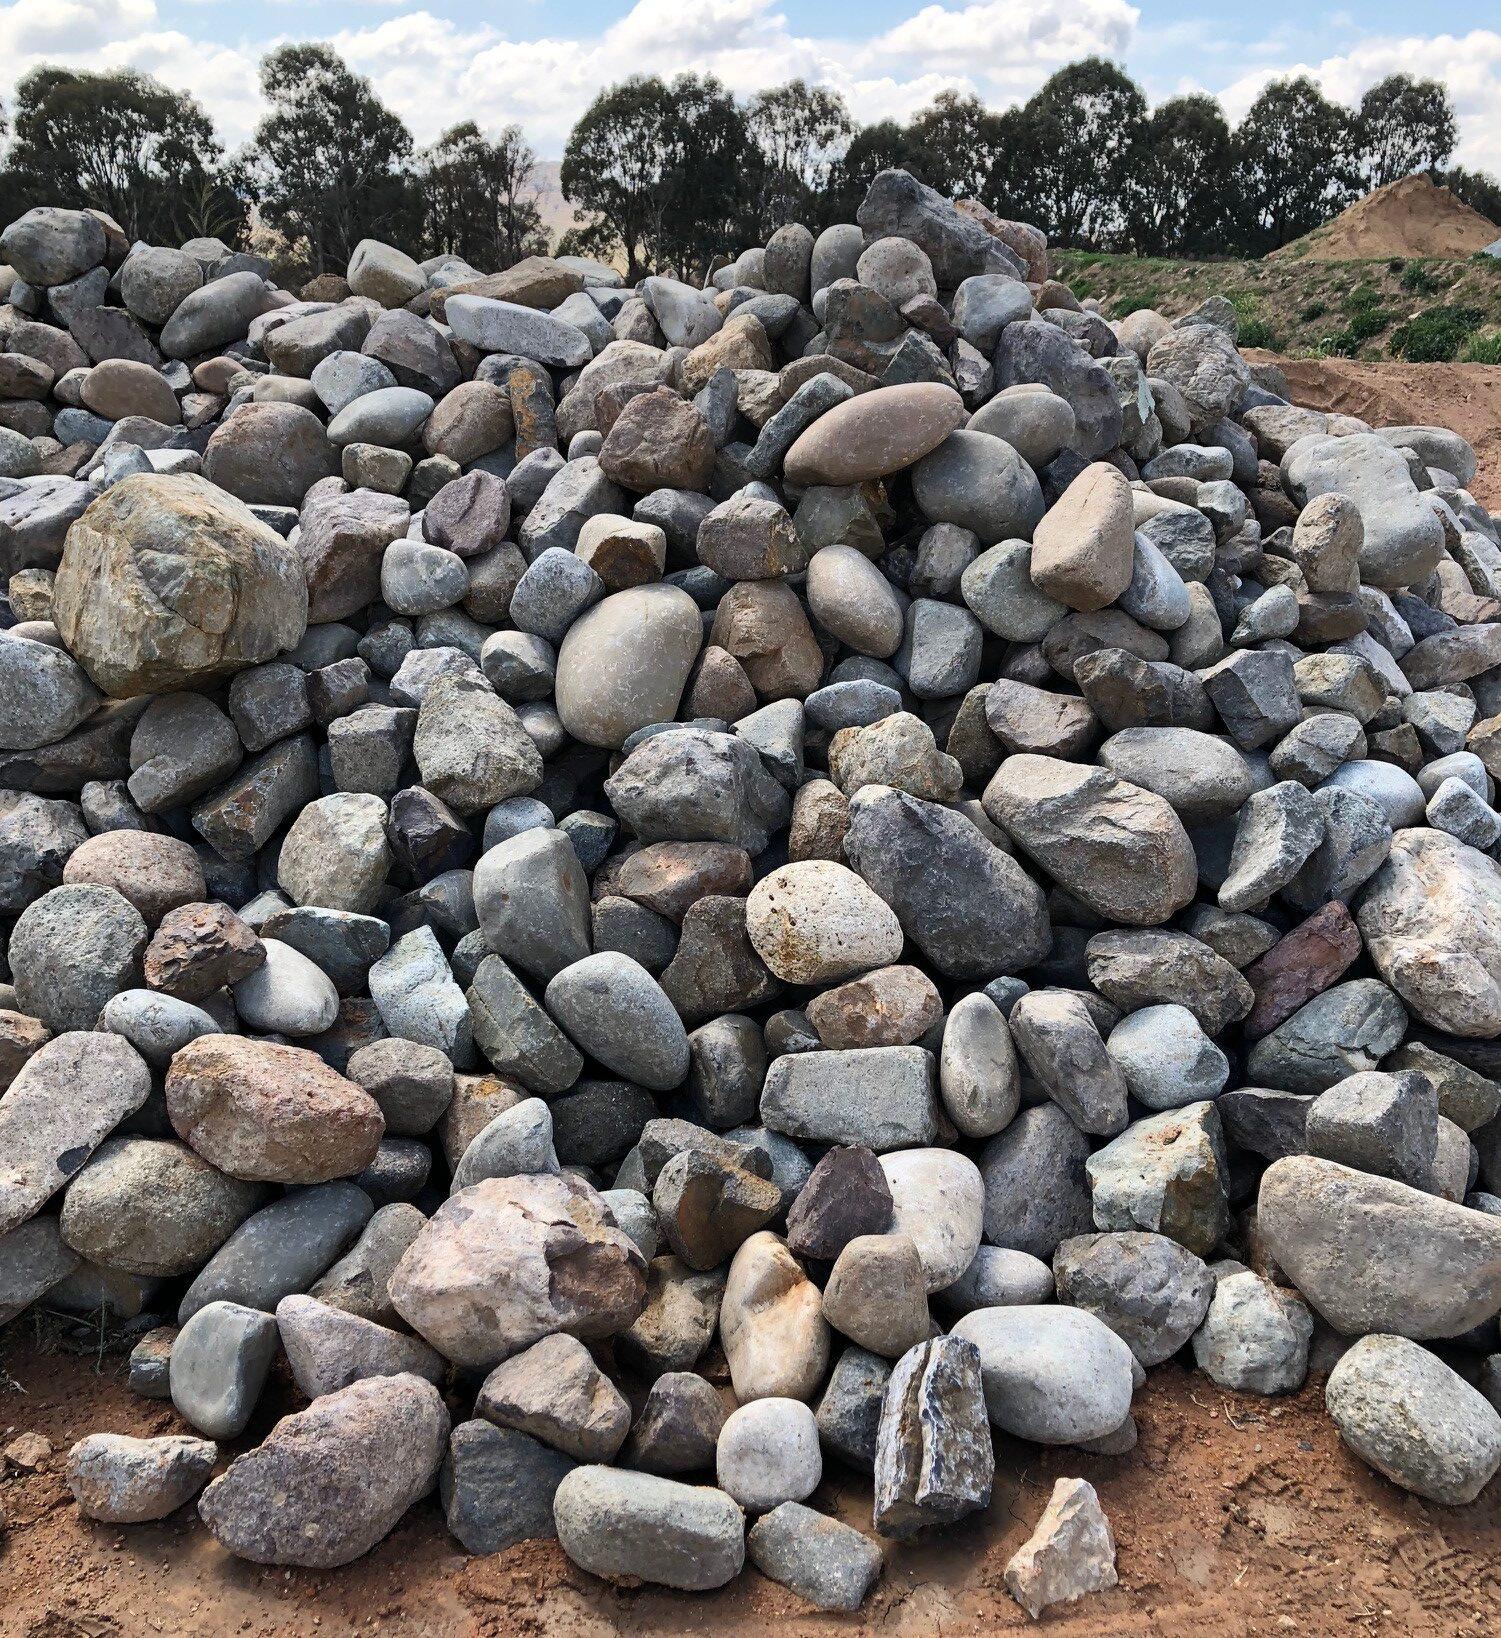 Tharwa Sands Ornamental River Stone #1